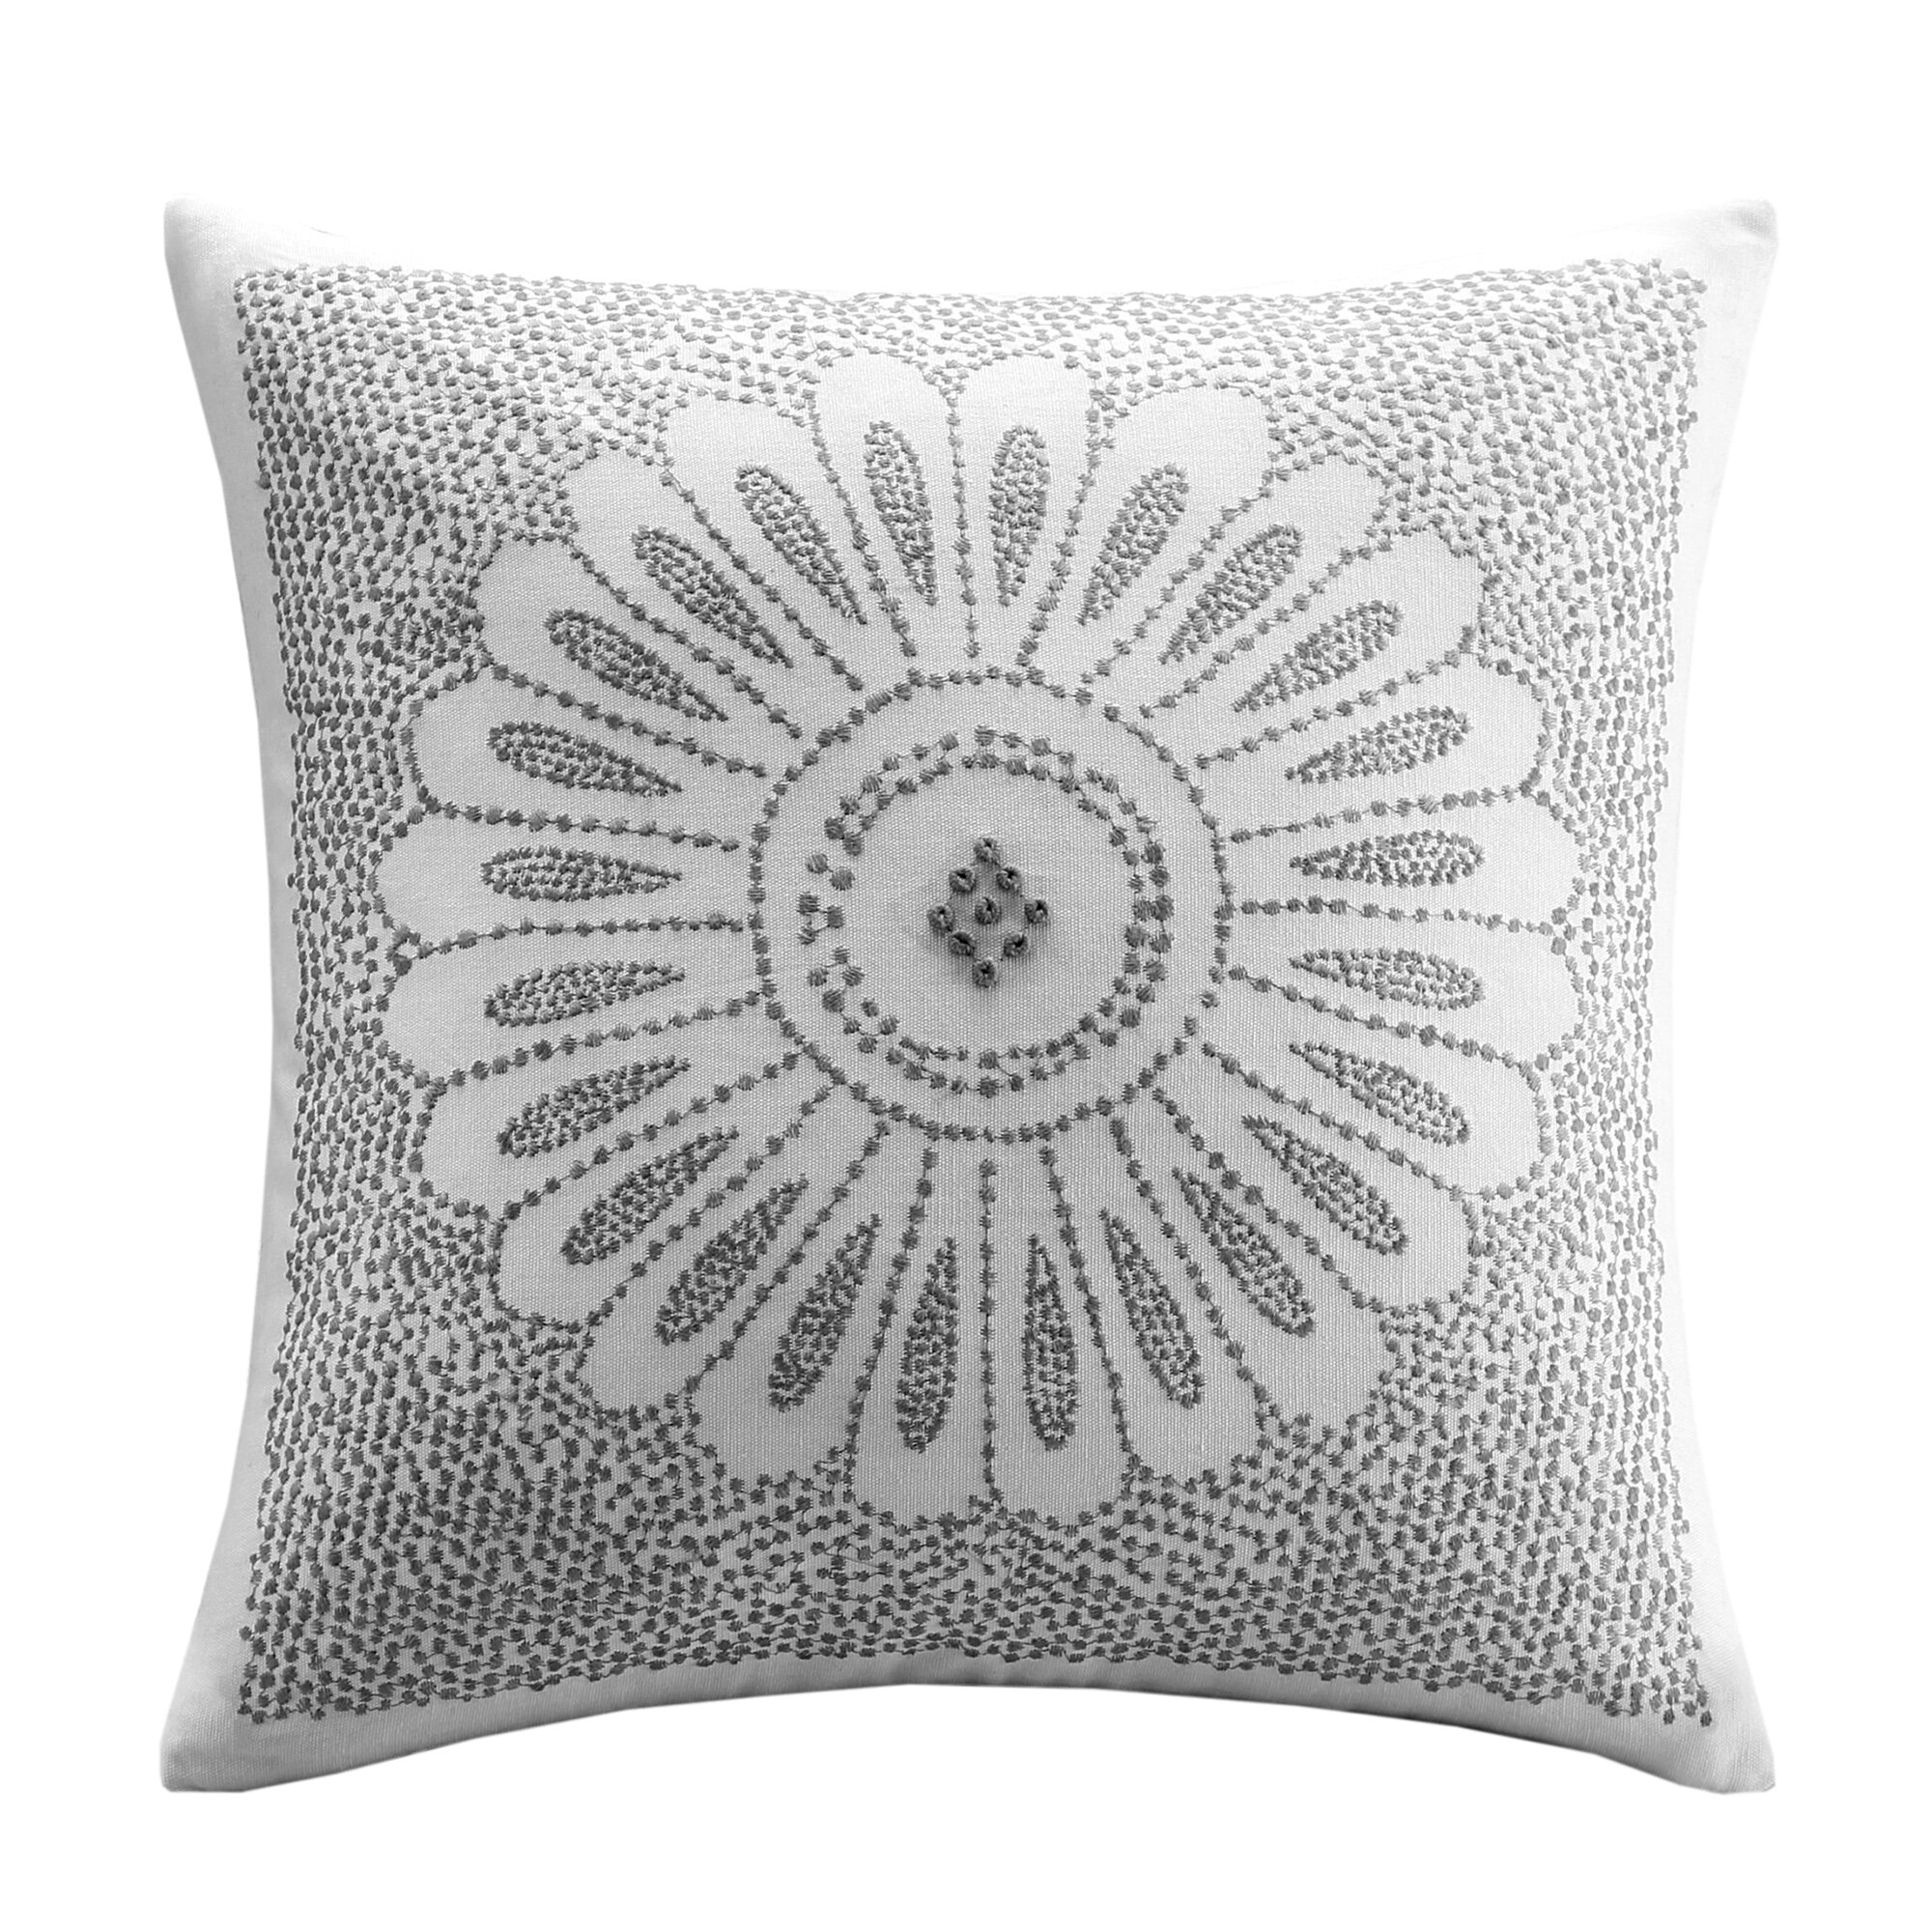 The Twillery Co Elliot Decorative Throw Pillow Reviews Wayfair